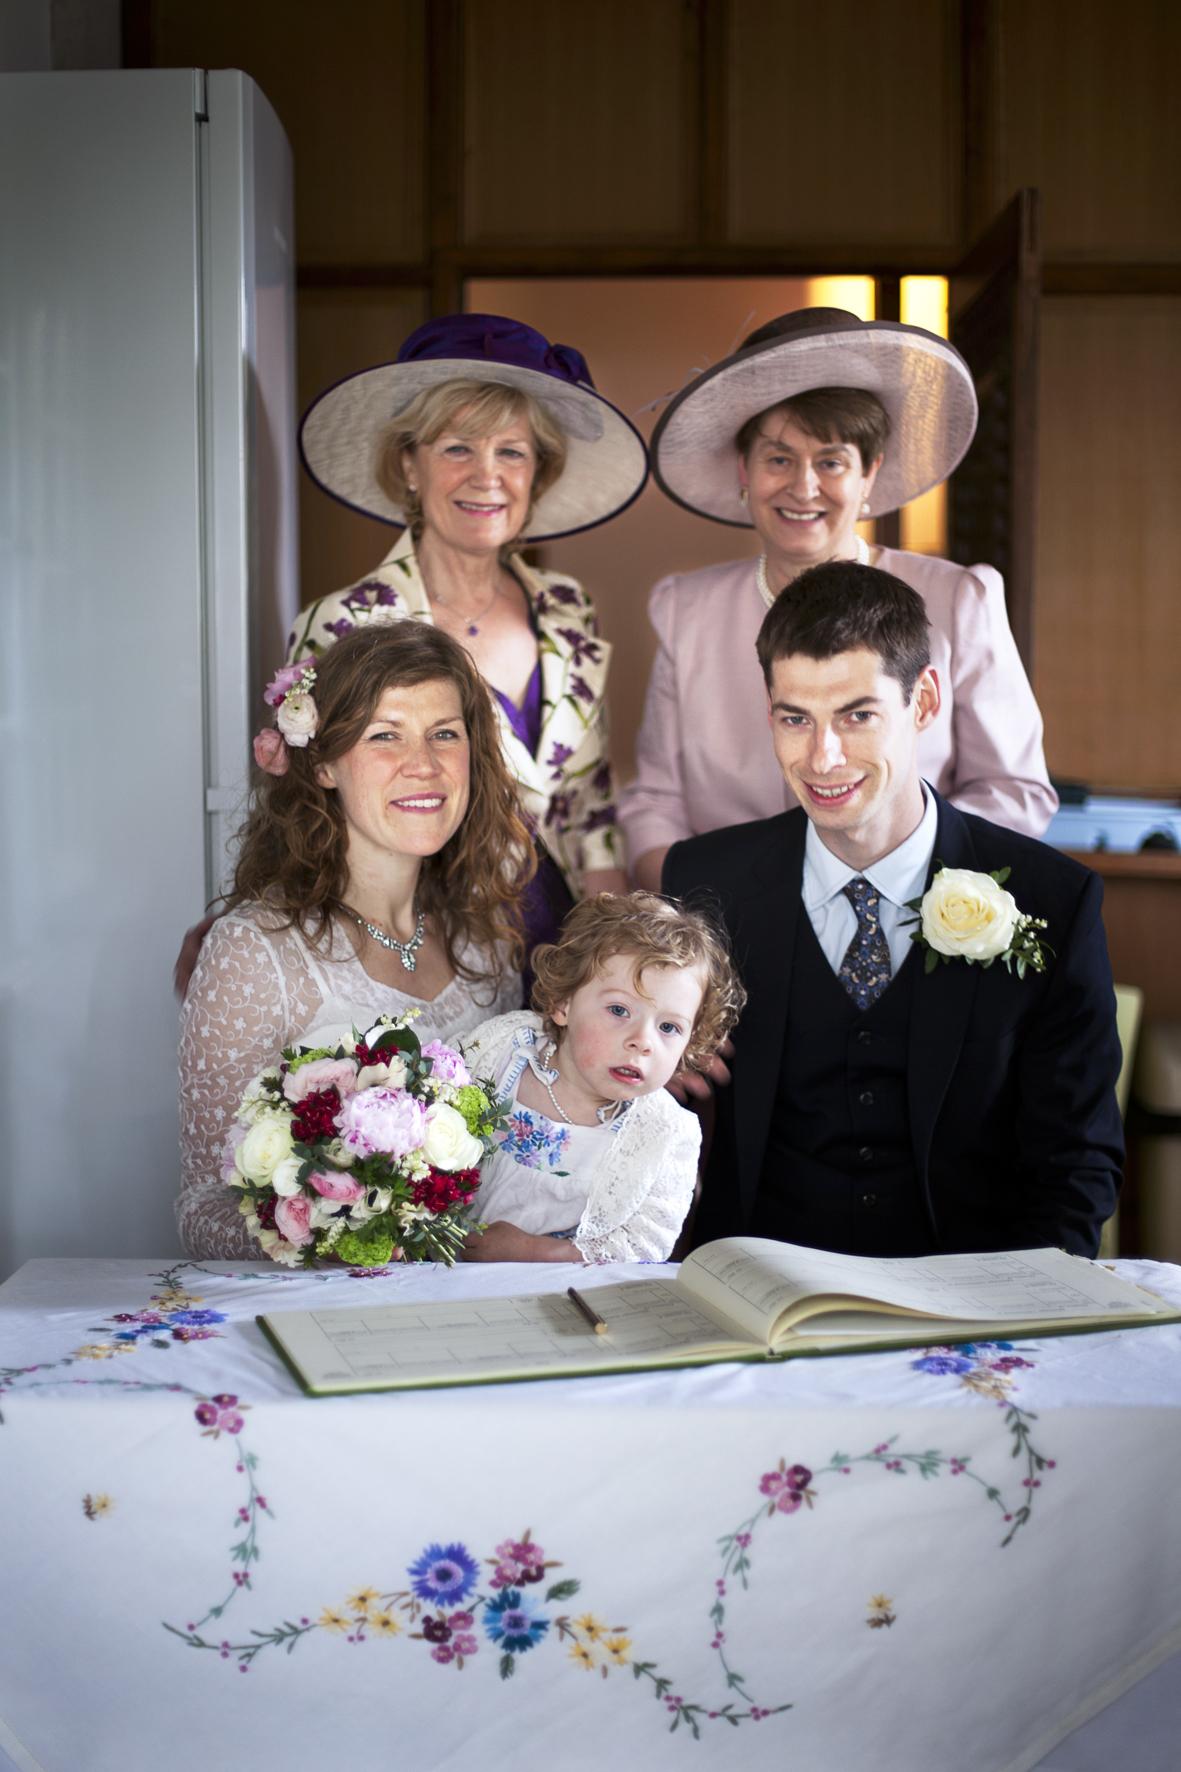 Wedding example_M&P__MG_3518-Edit_Claudia Leisinger.jpg